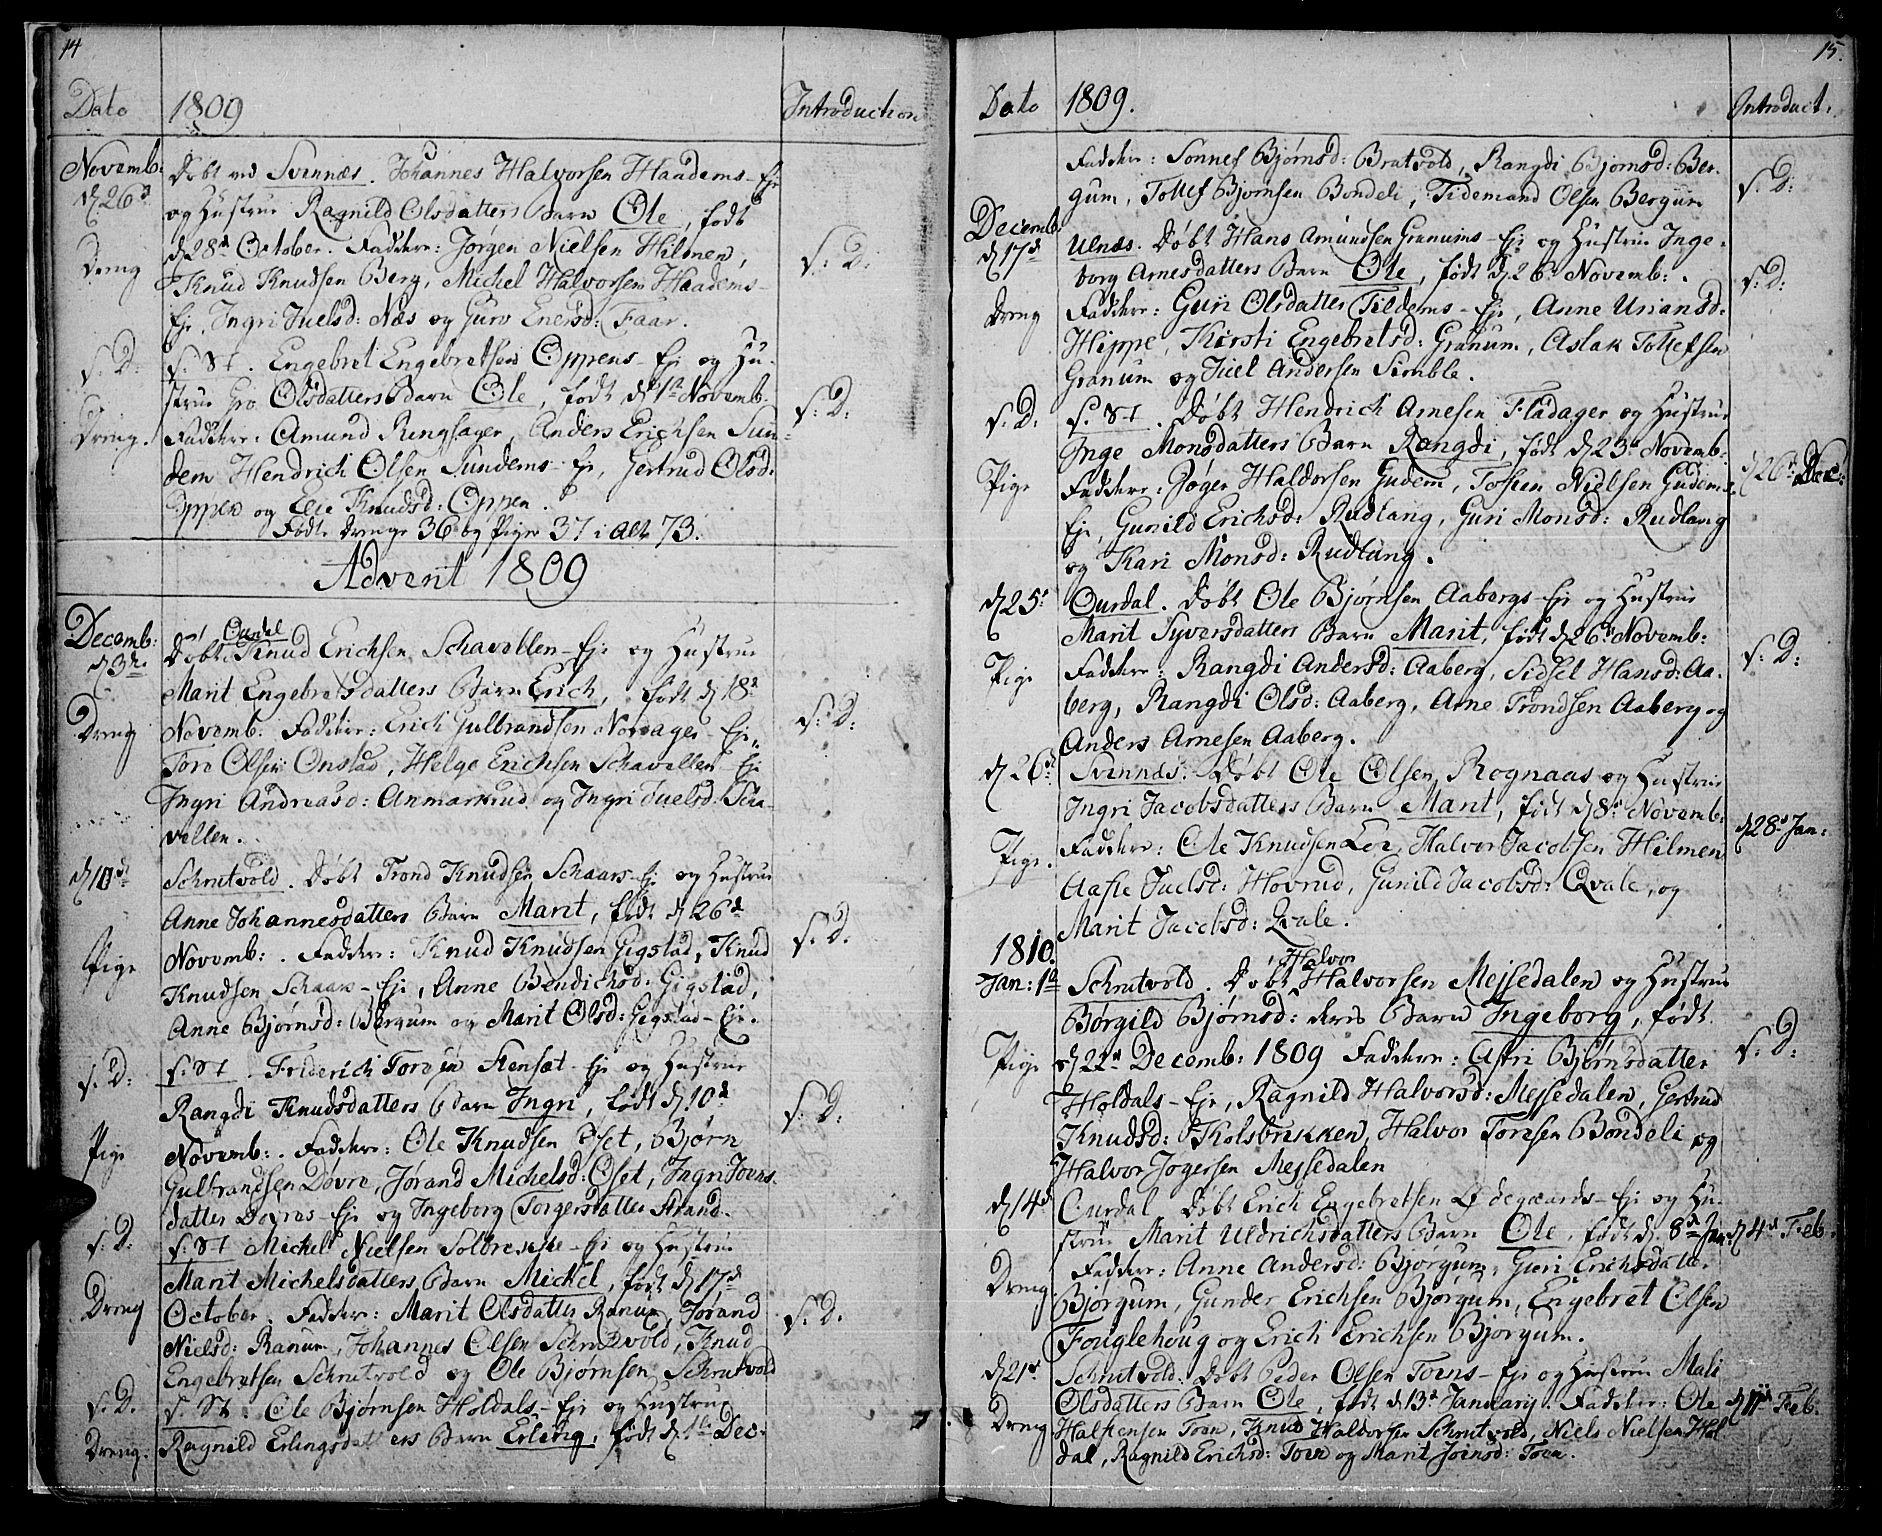 SAH, Nord-Aurdal prestekontor, Ministerialbok nr. 1, 1808-1815, s. 14-15